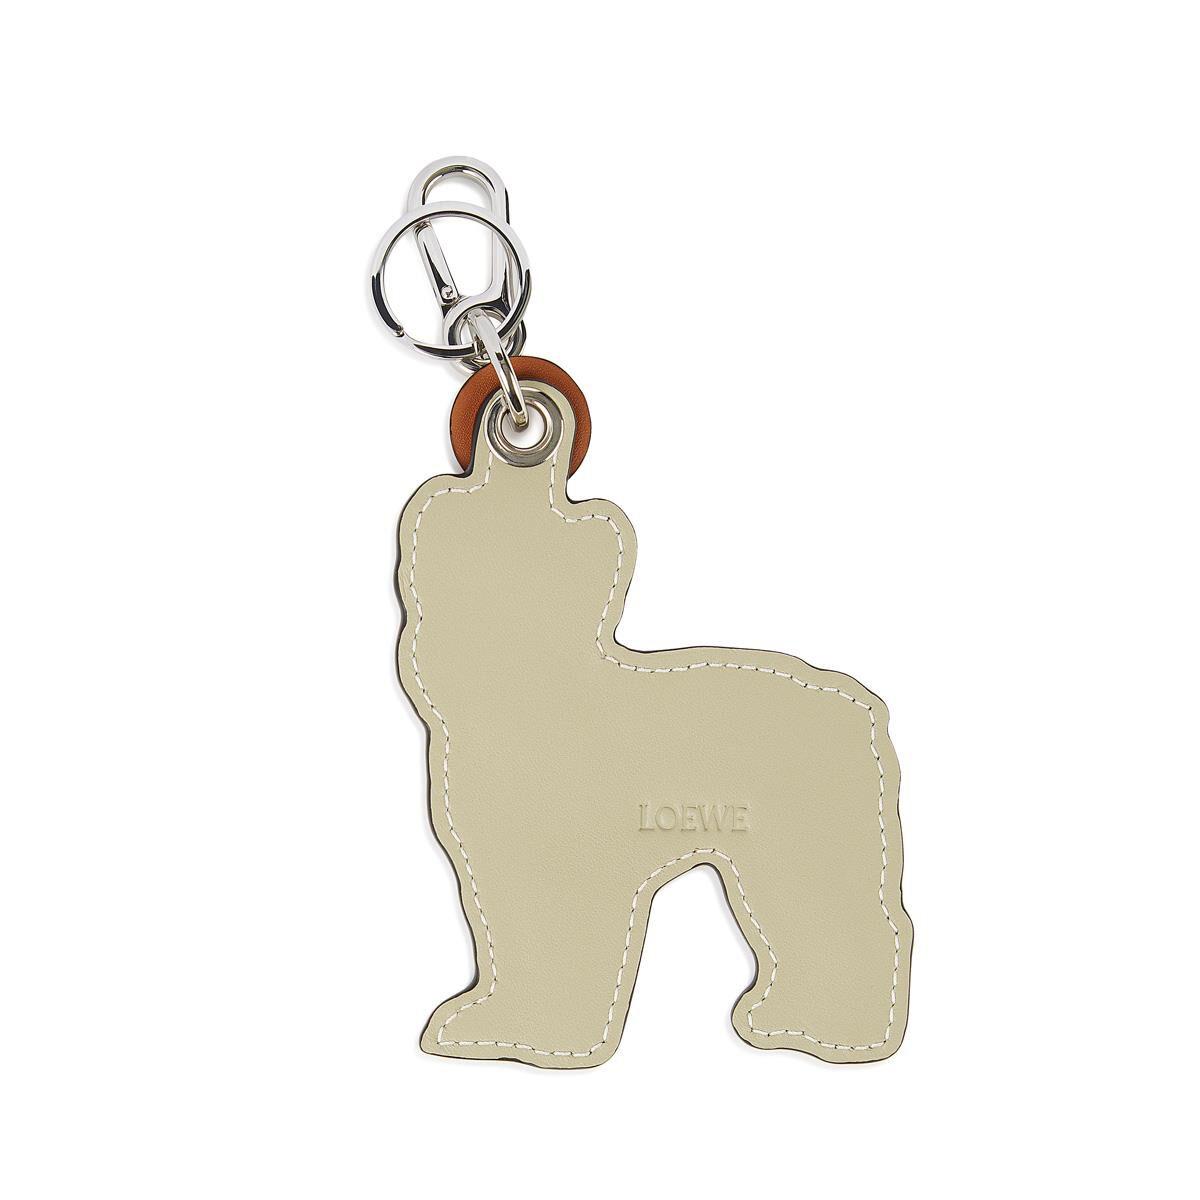 LOEWE Charm Perro Bulldog Bronceado/Marfil all